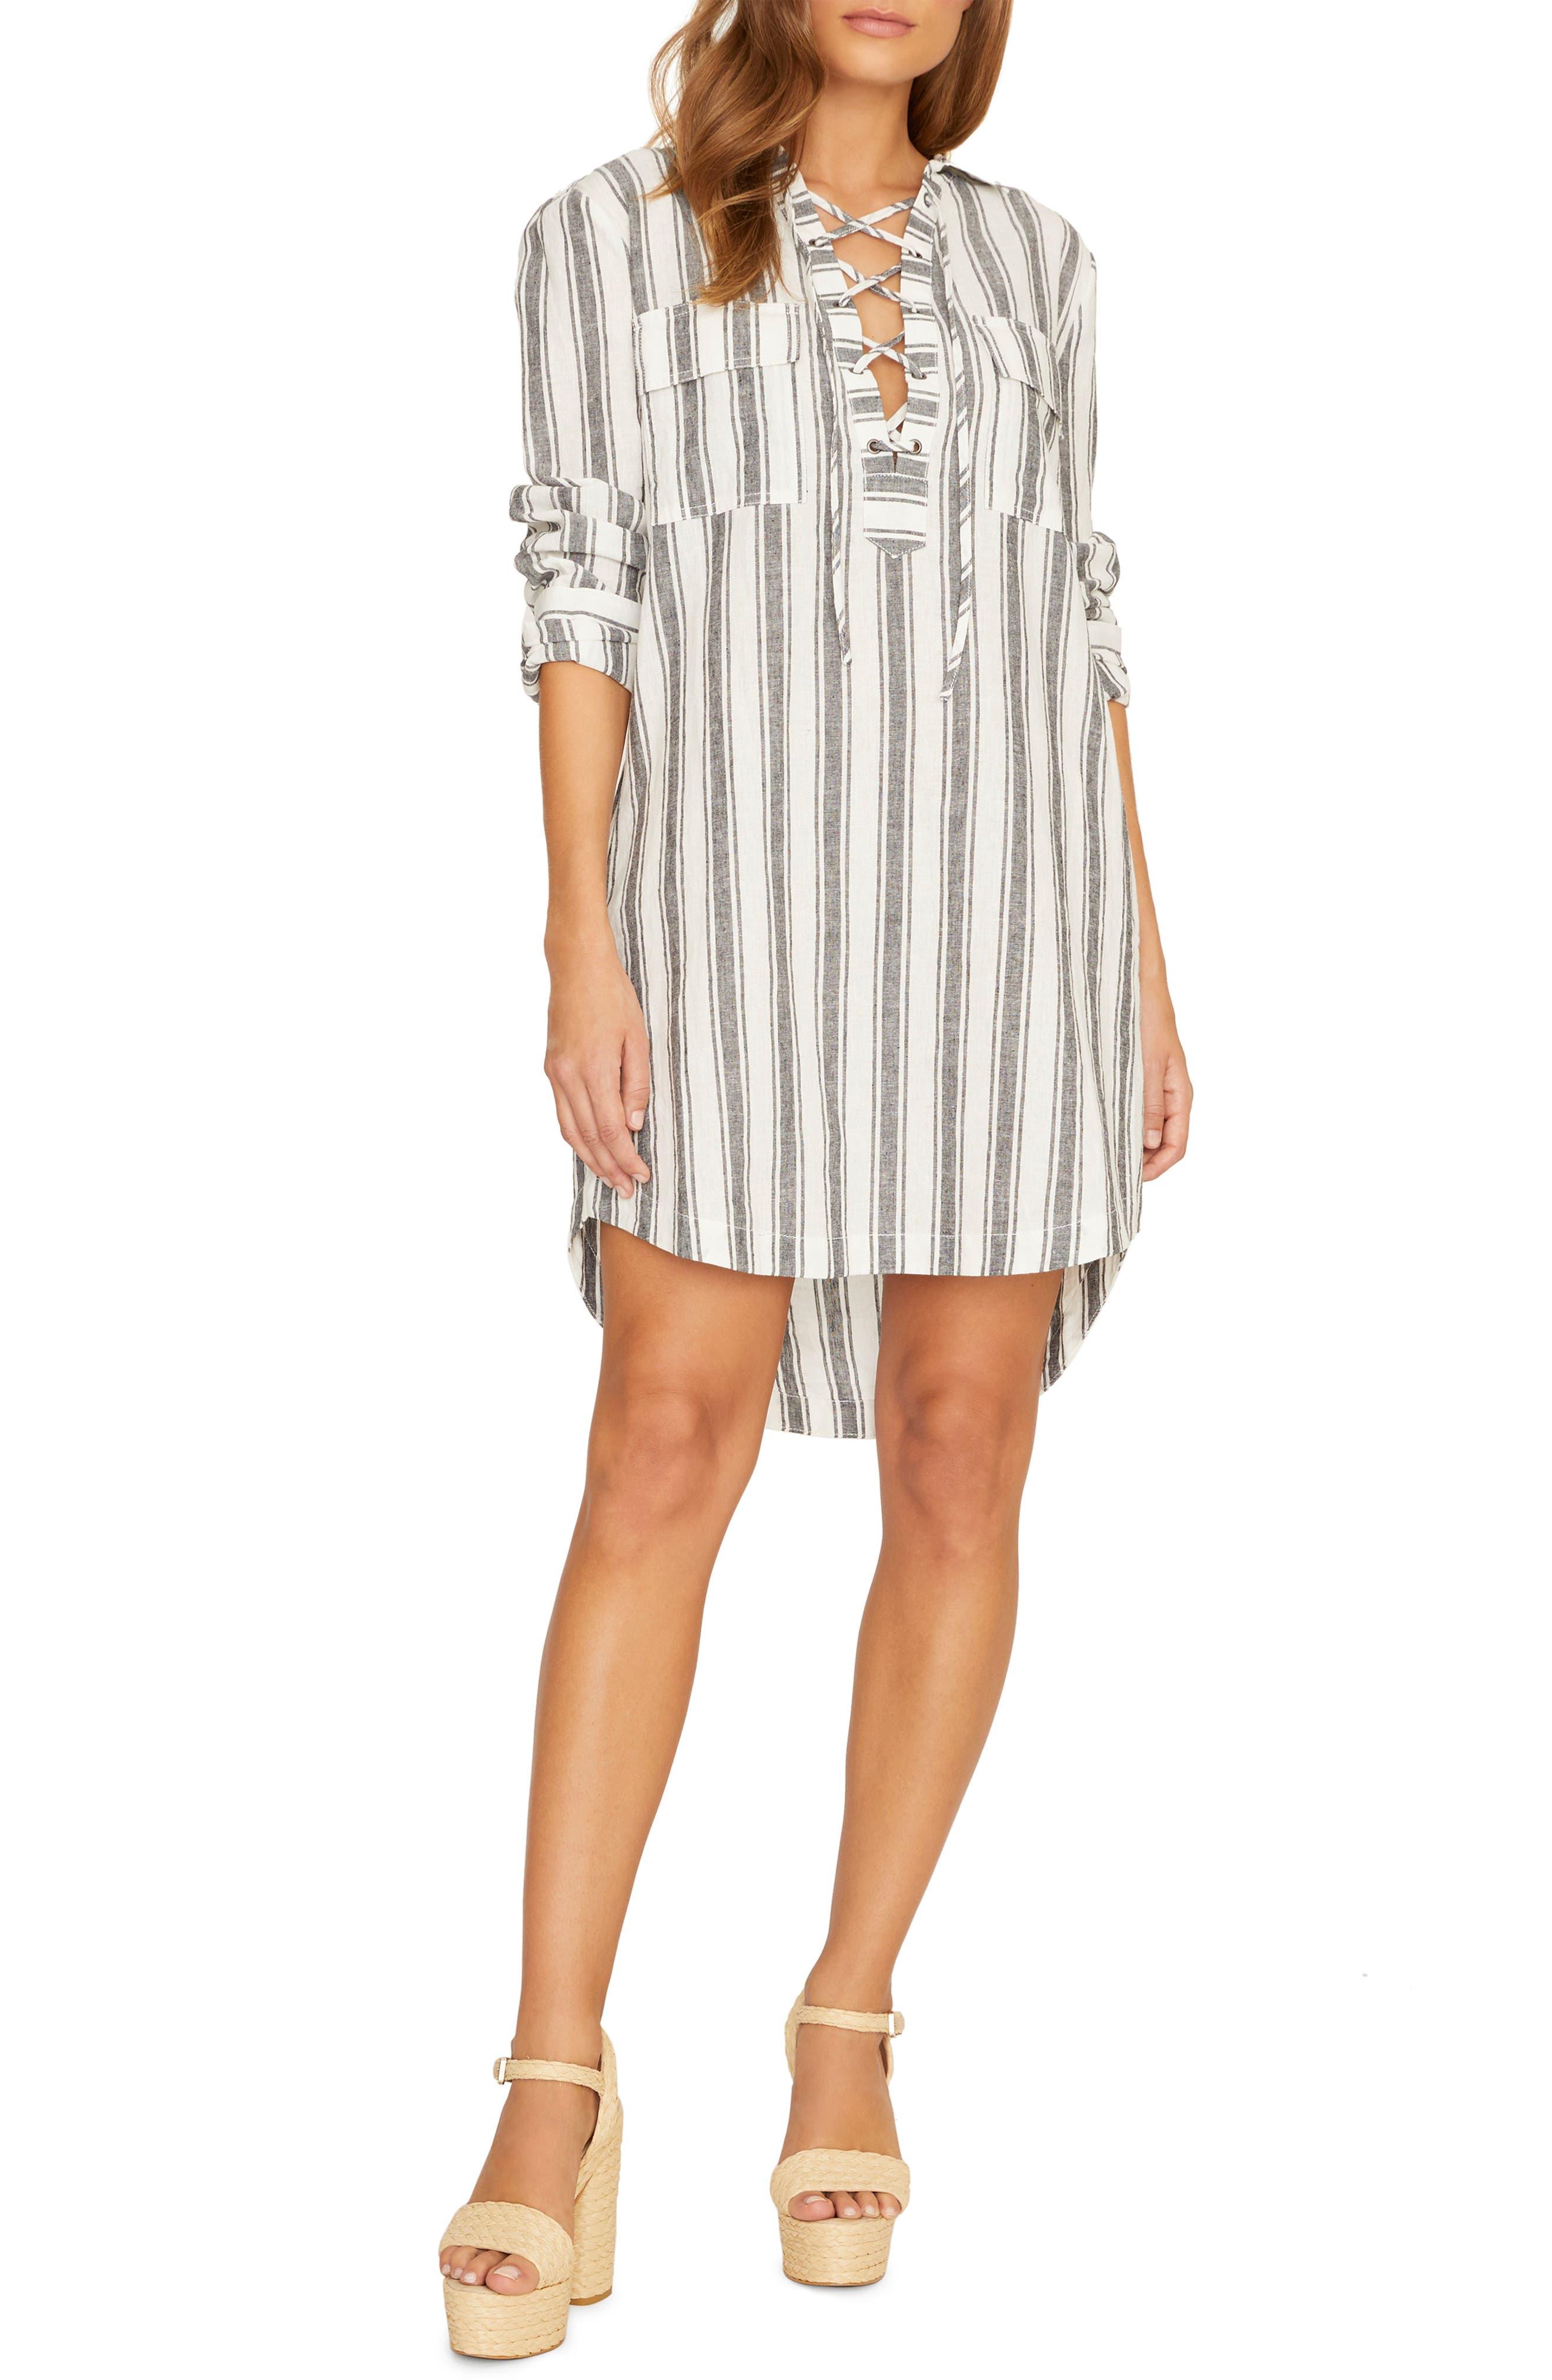 Sanctuary Staycation Stripe Lace-Up Long Sleeve Linen Blend Dress, Blue